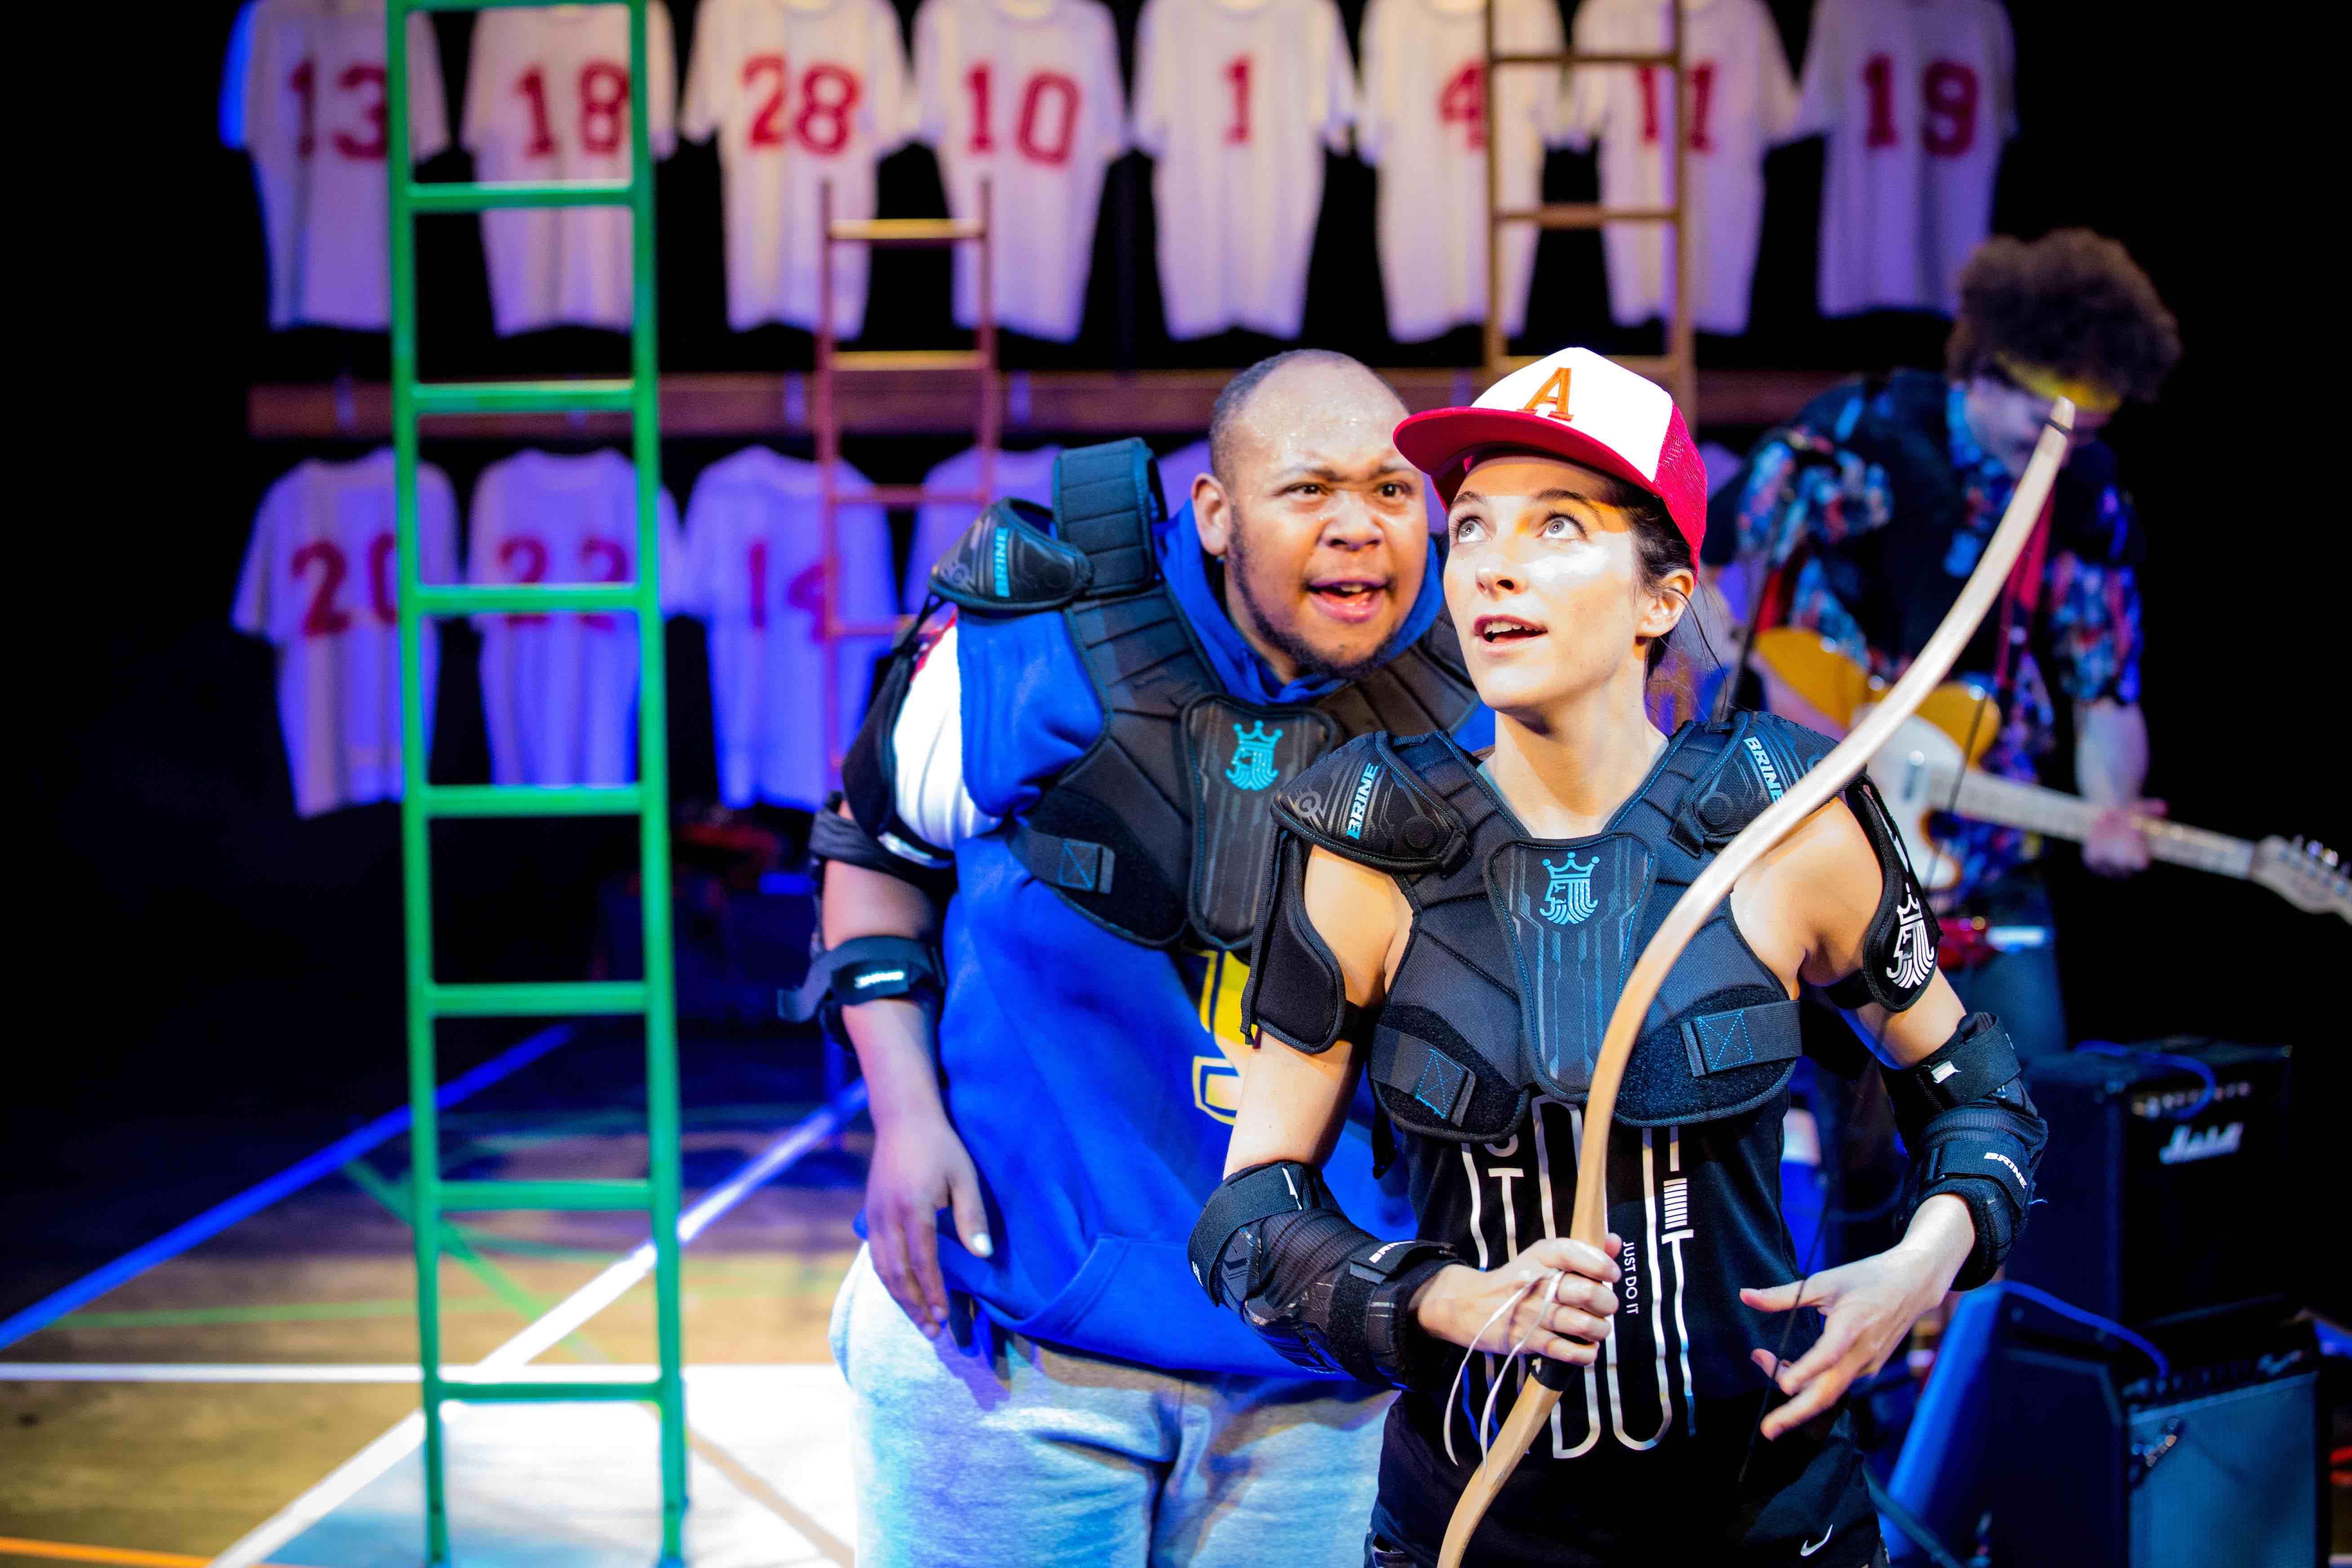 HelenMurray-Jason-and-the-Argonauts-Unicorn-Theatre-370.jpg